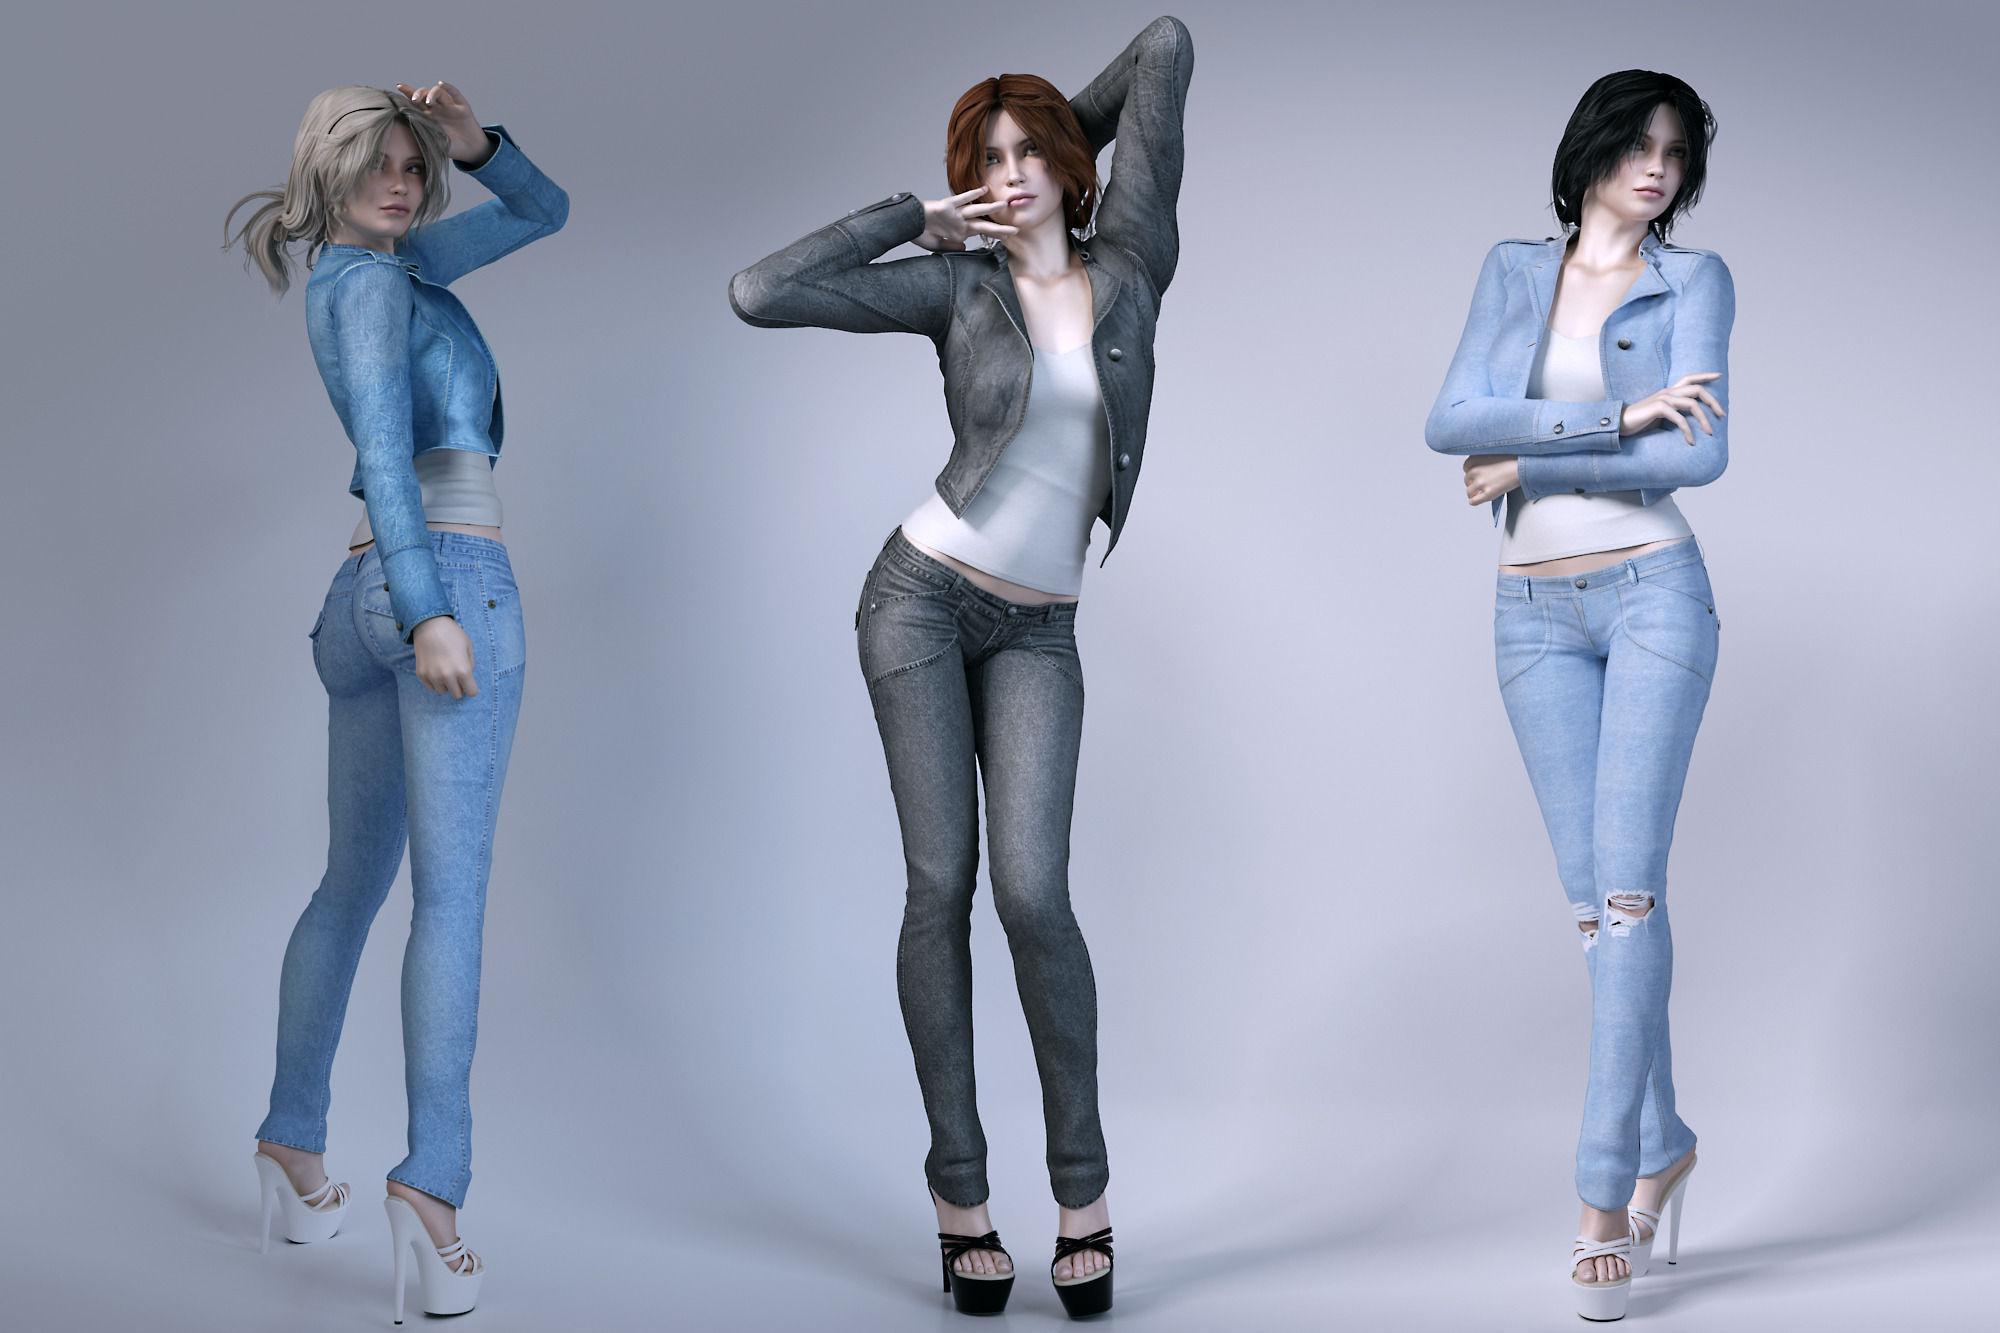 Girls Wear Jeans 3d Model Max Obj Fbx